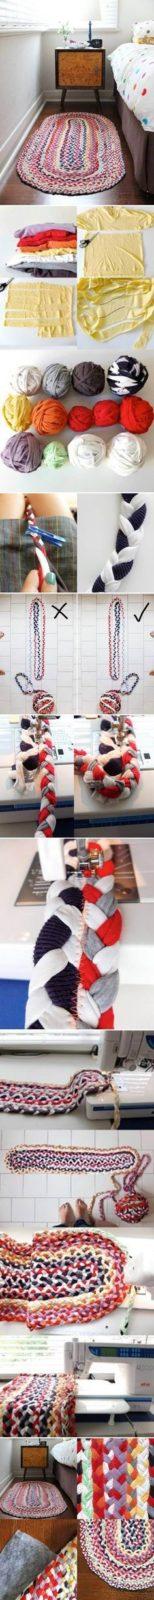 Подарок бабушке своими руками: коврик из ткани